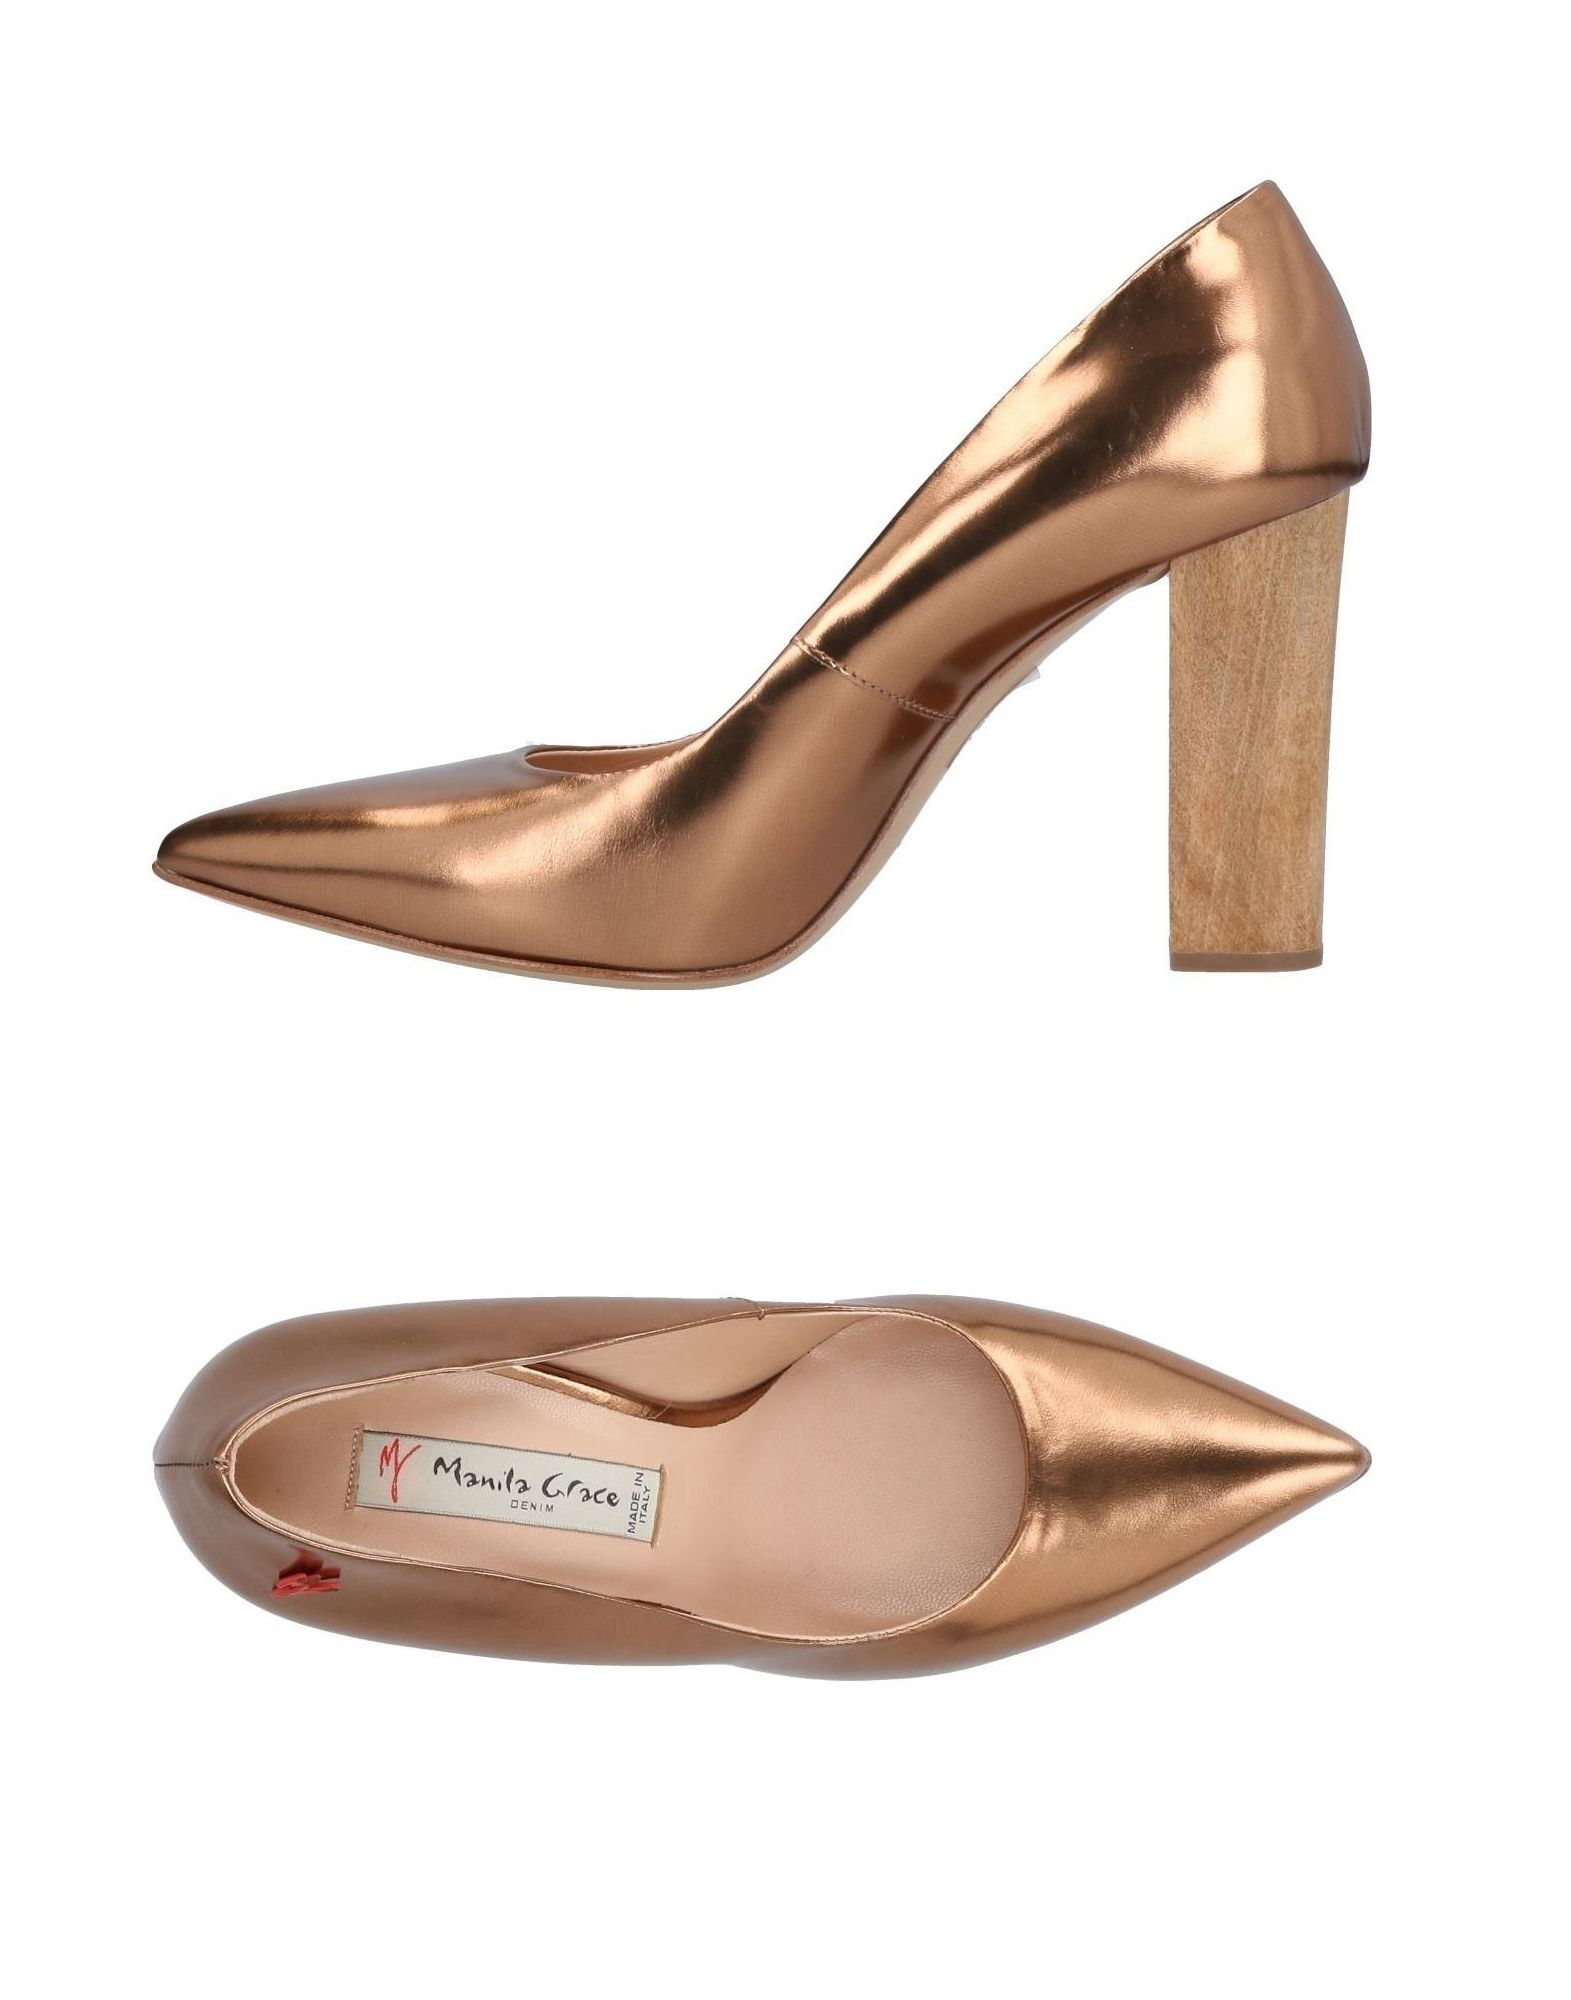 Sandali Dkny Donna - scarpe 11459191EG Nuove offerte e scarpe - comode f5d874